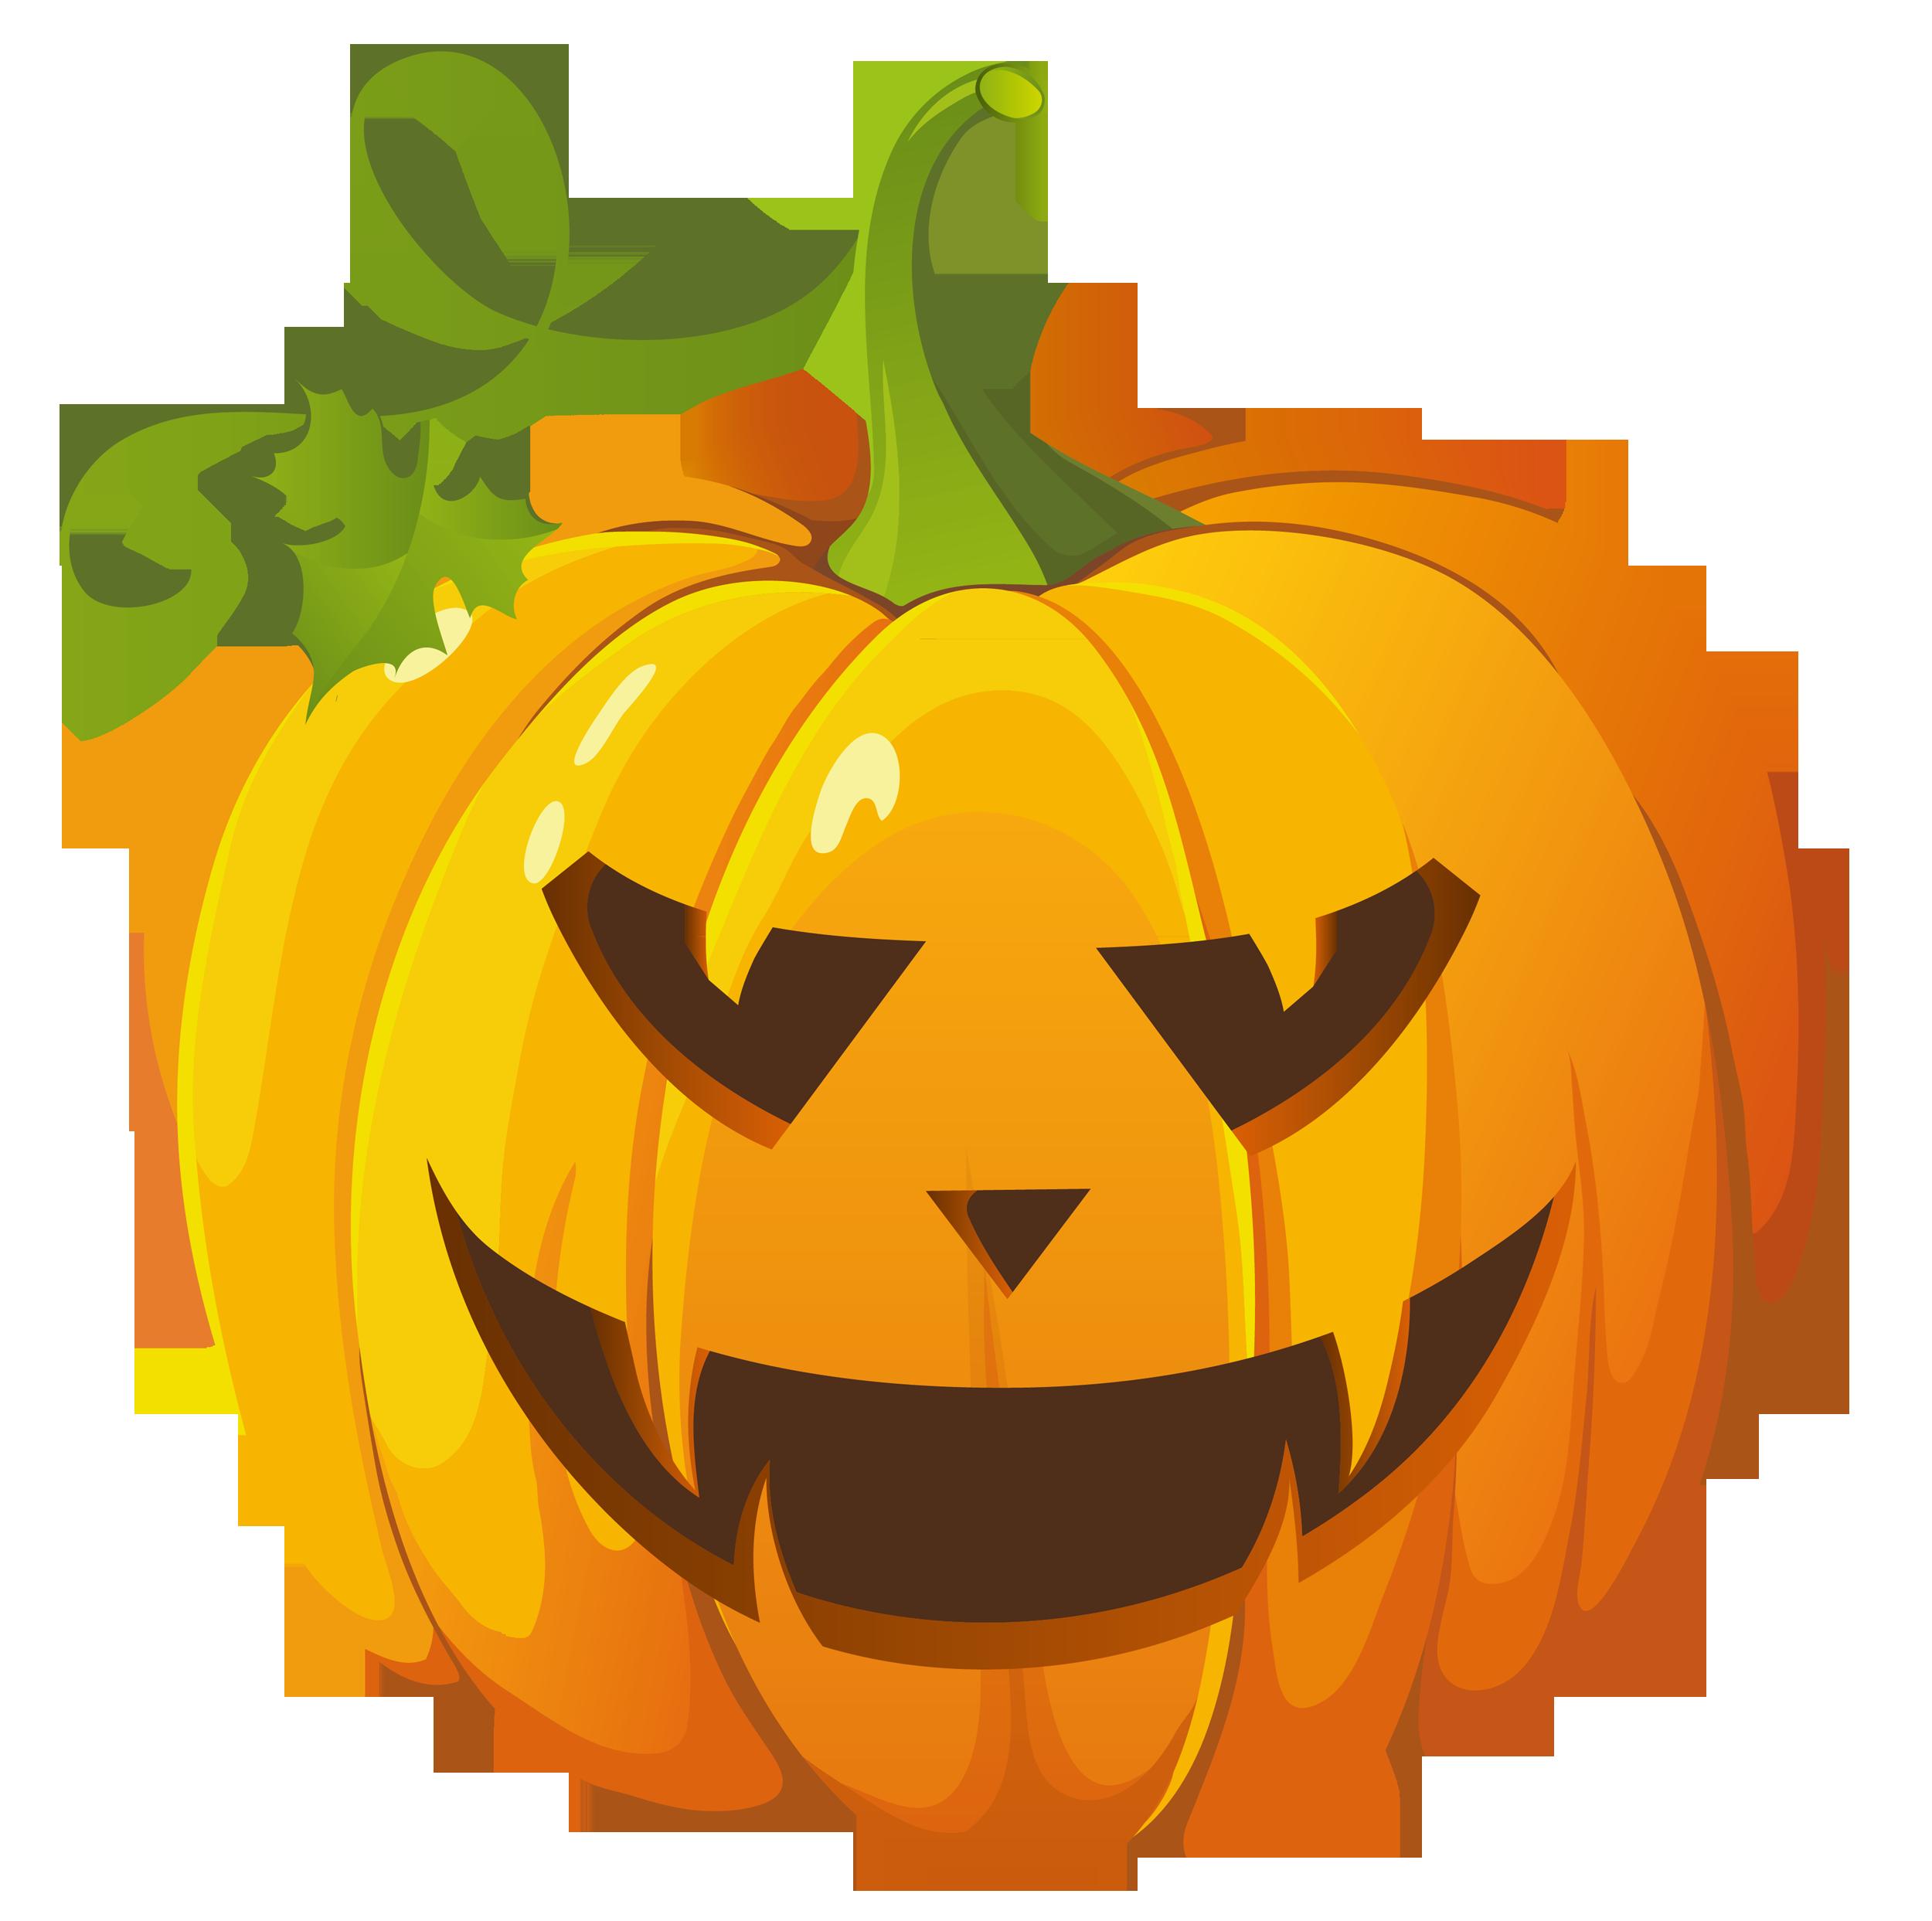 image result for halloween pumpkin estudio de formas pinterest rh pinterest com cute halloween pumpkin clipart halloween pumpkin clipart free